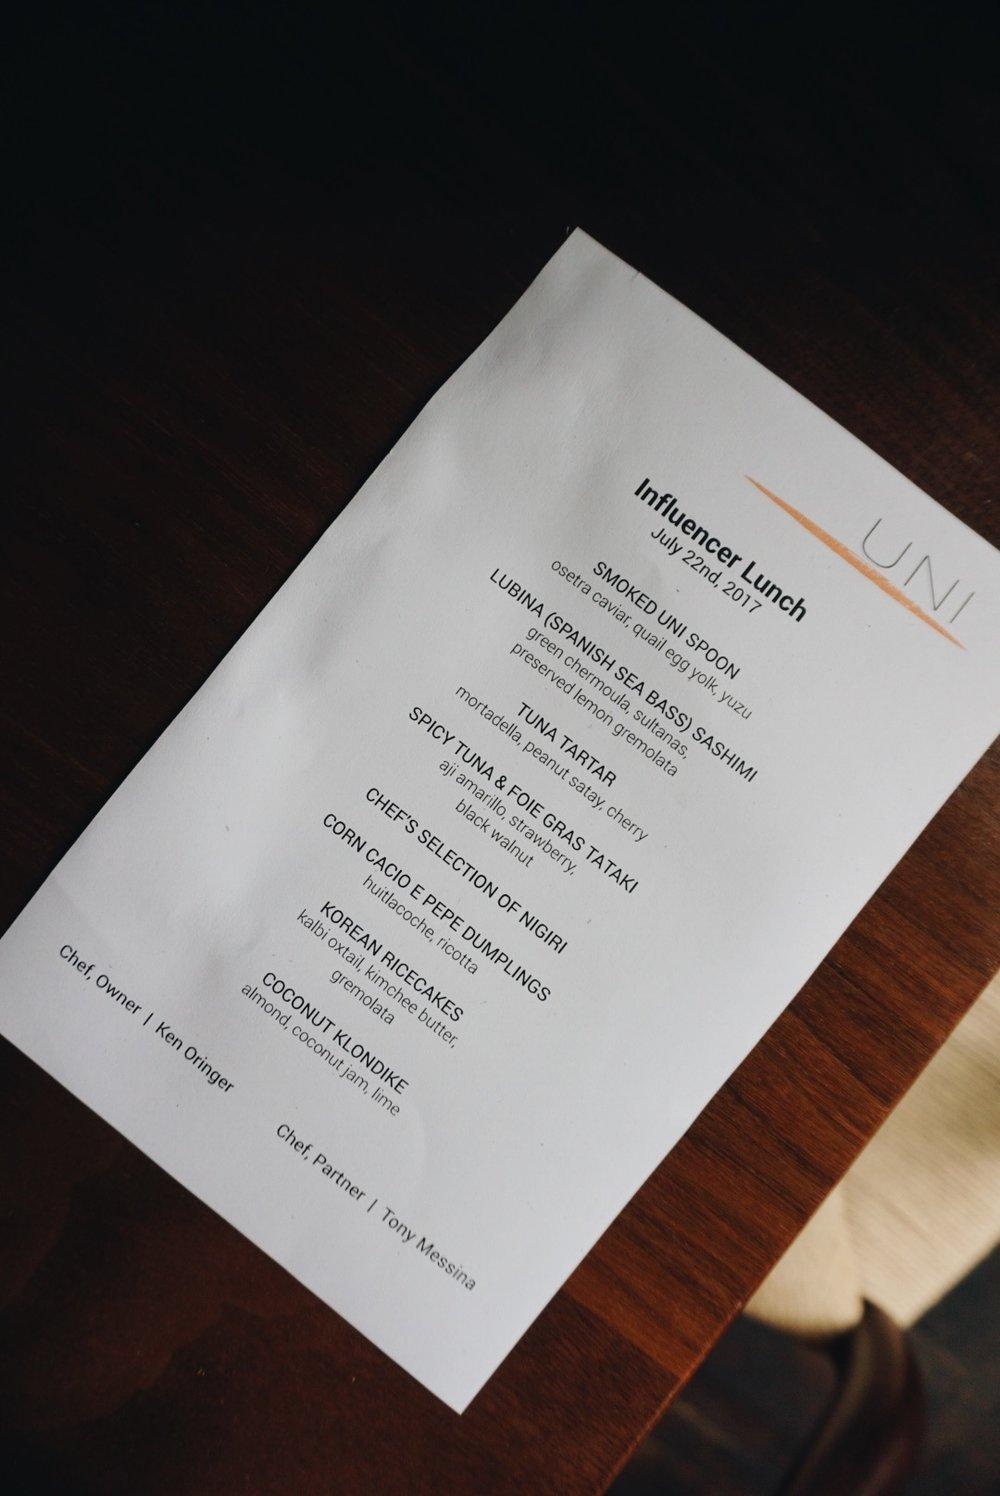 On the menu...